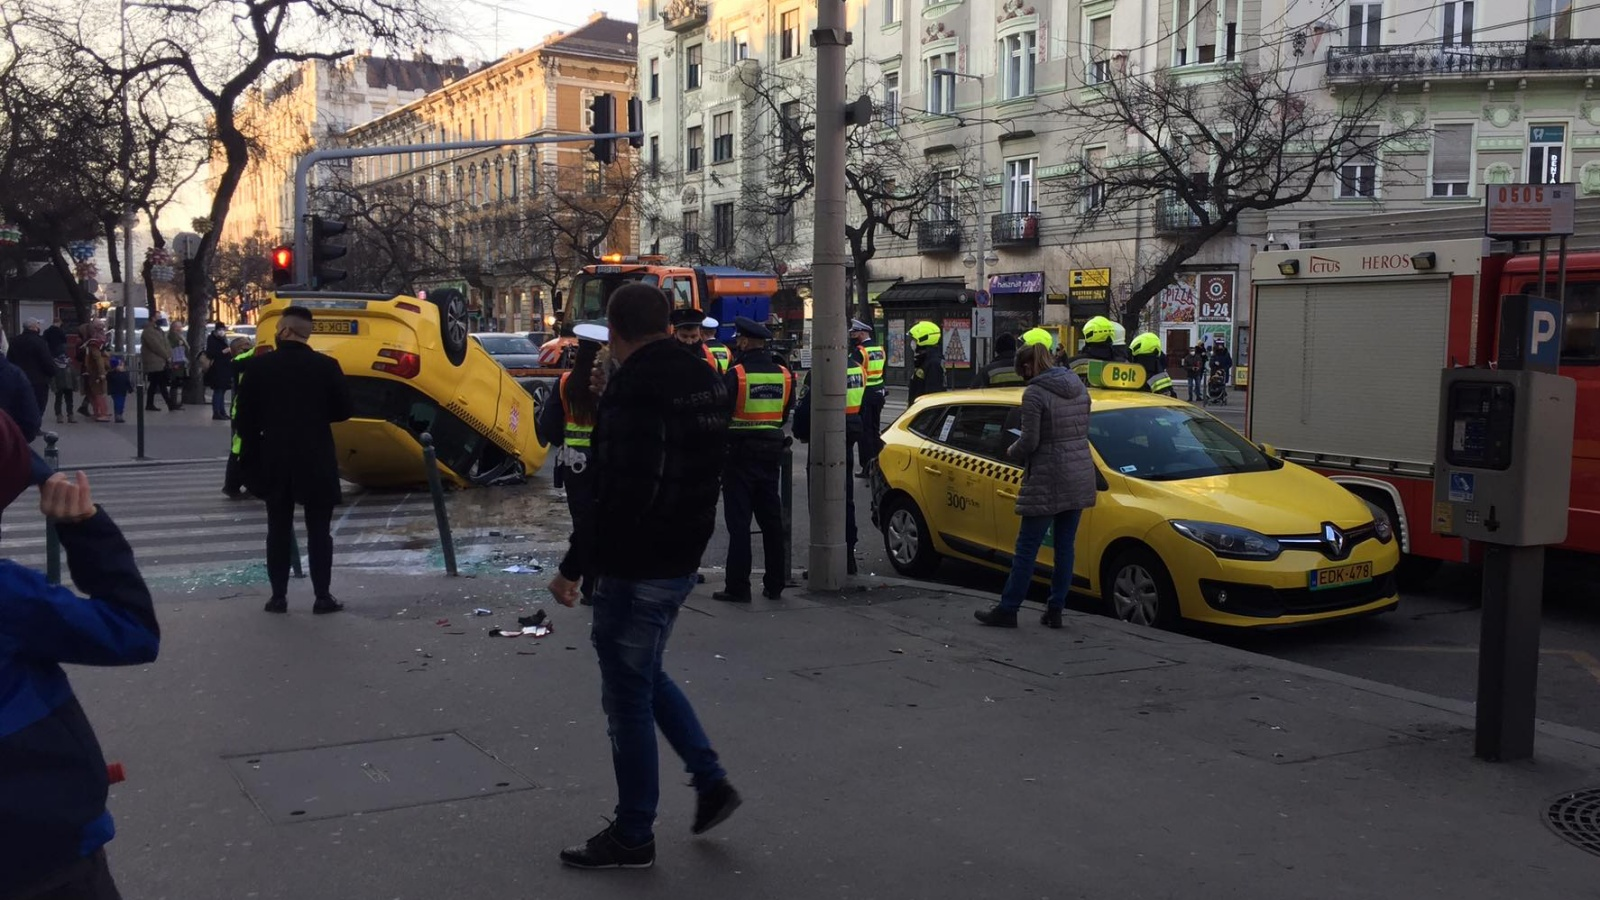 Felborult taxi Budapesten